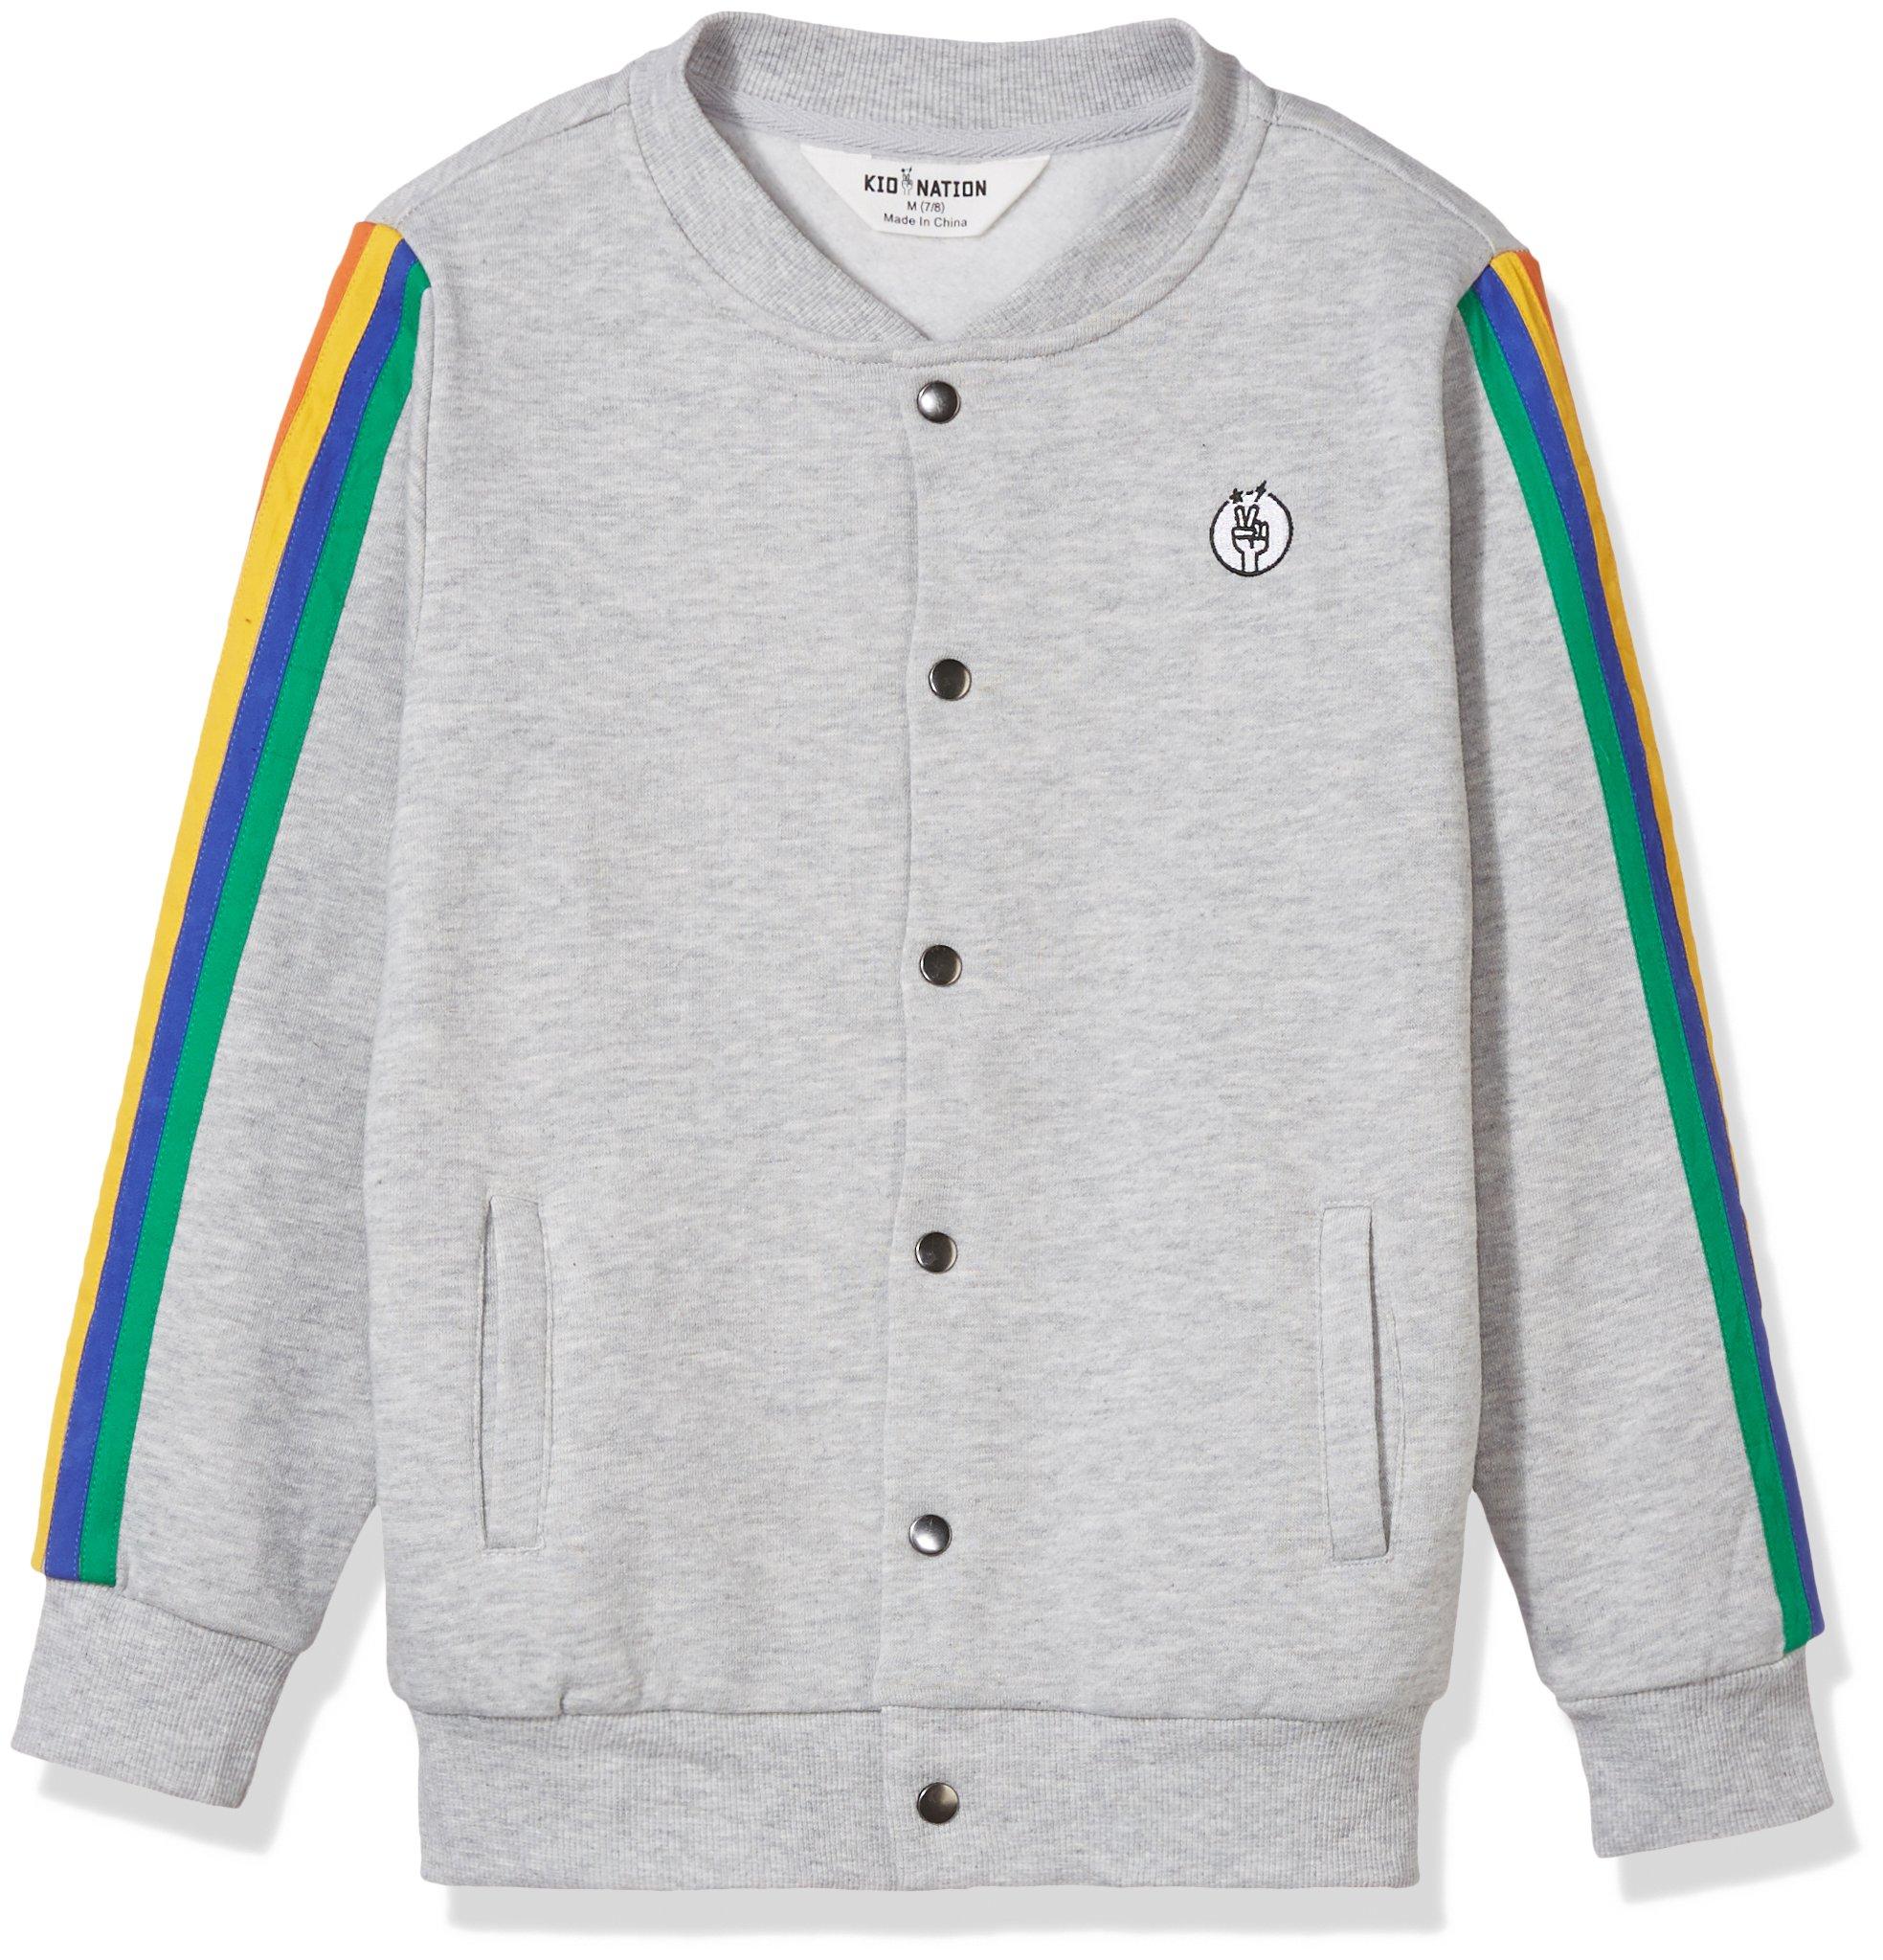 Kid Nation Kids' Fleece Track Jacket for Boys or Girls L Gray